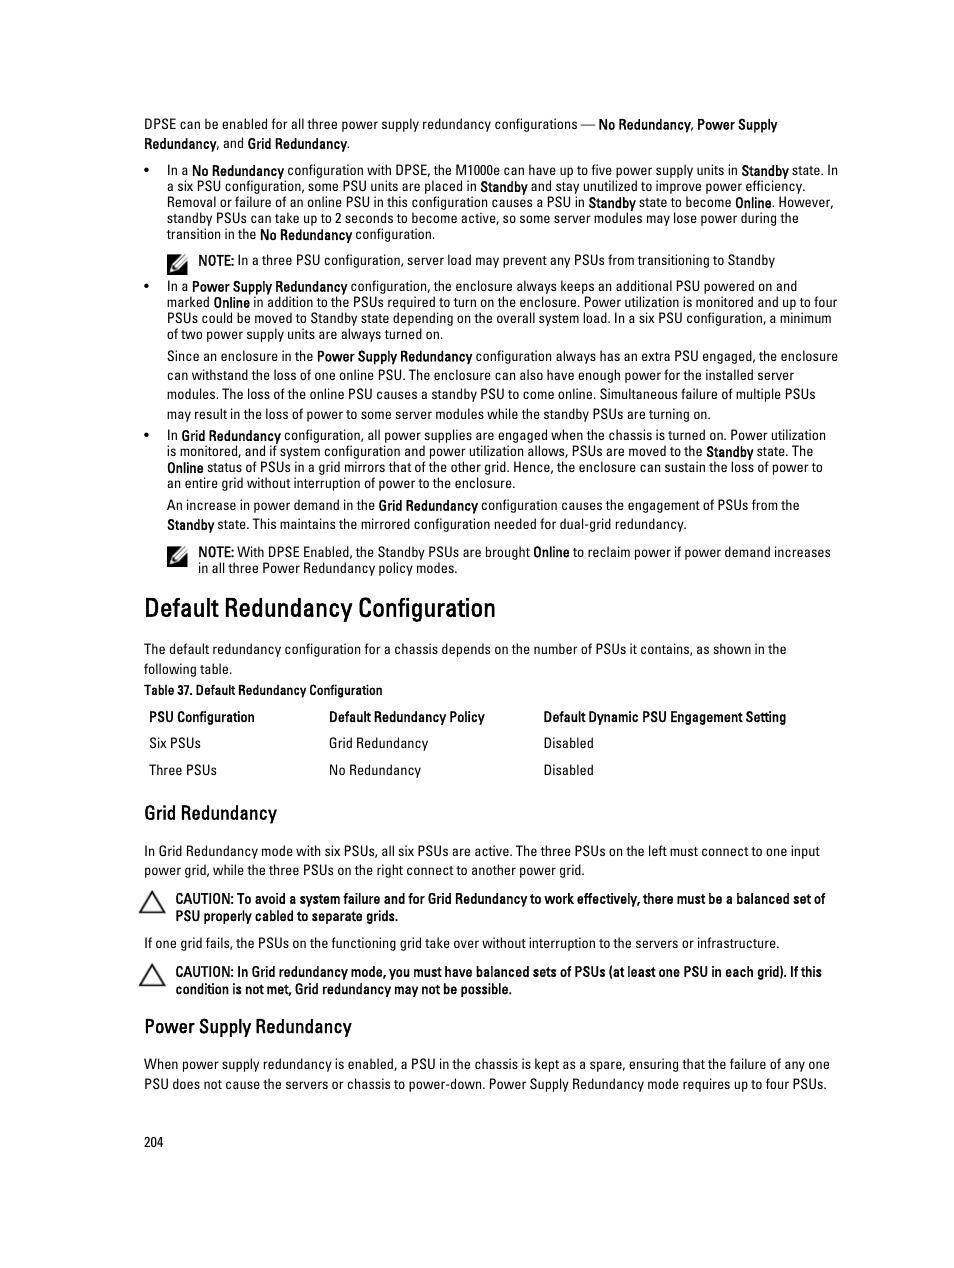 Default redundancy configuration, Grid redundancy, Power